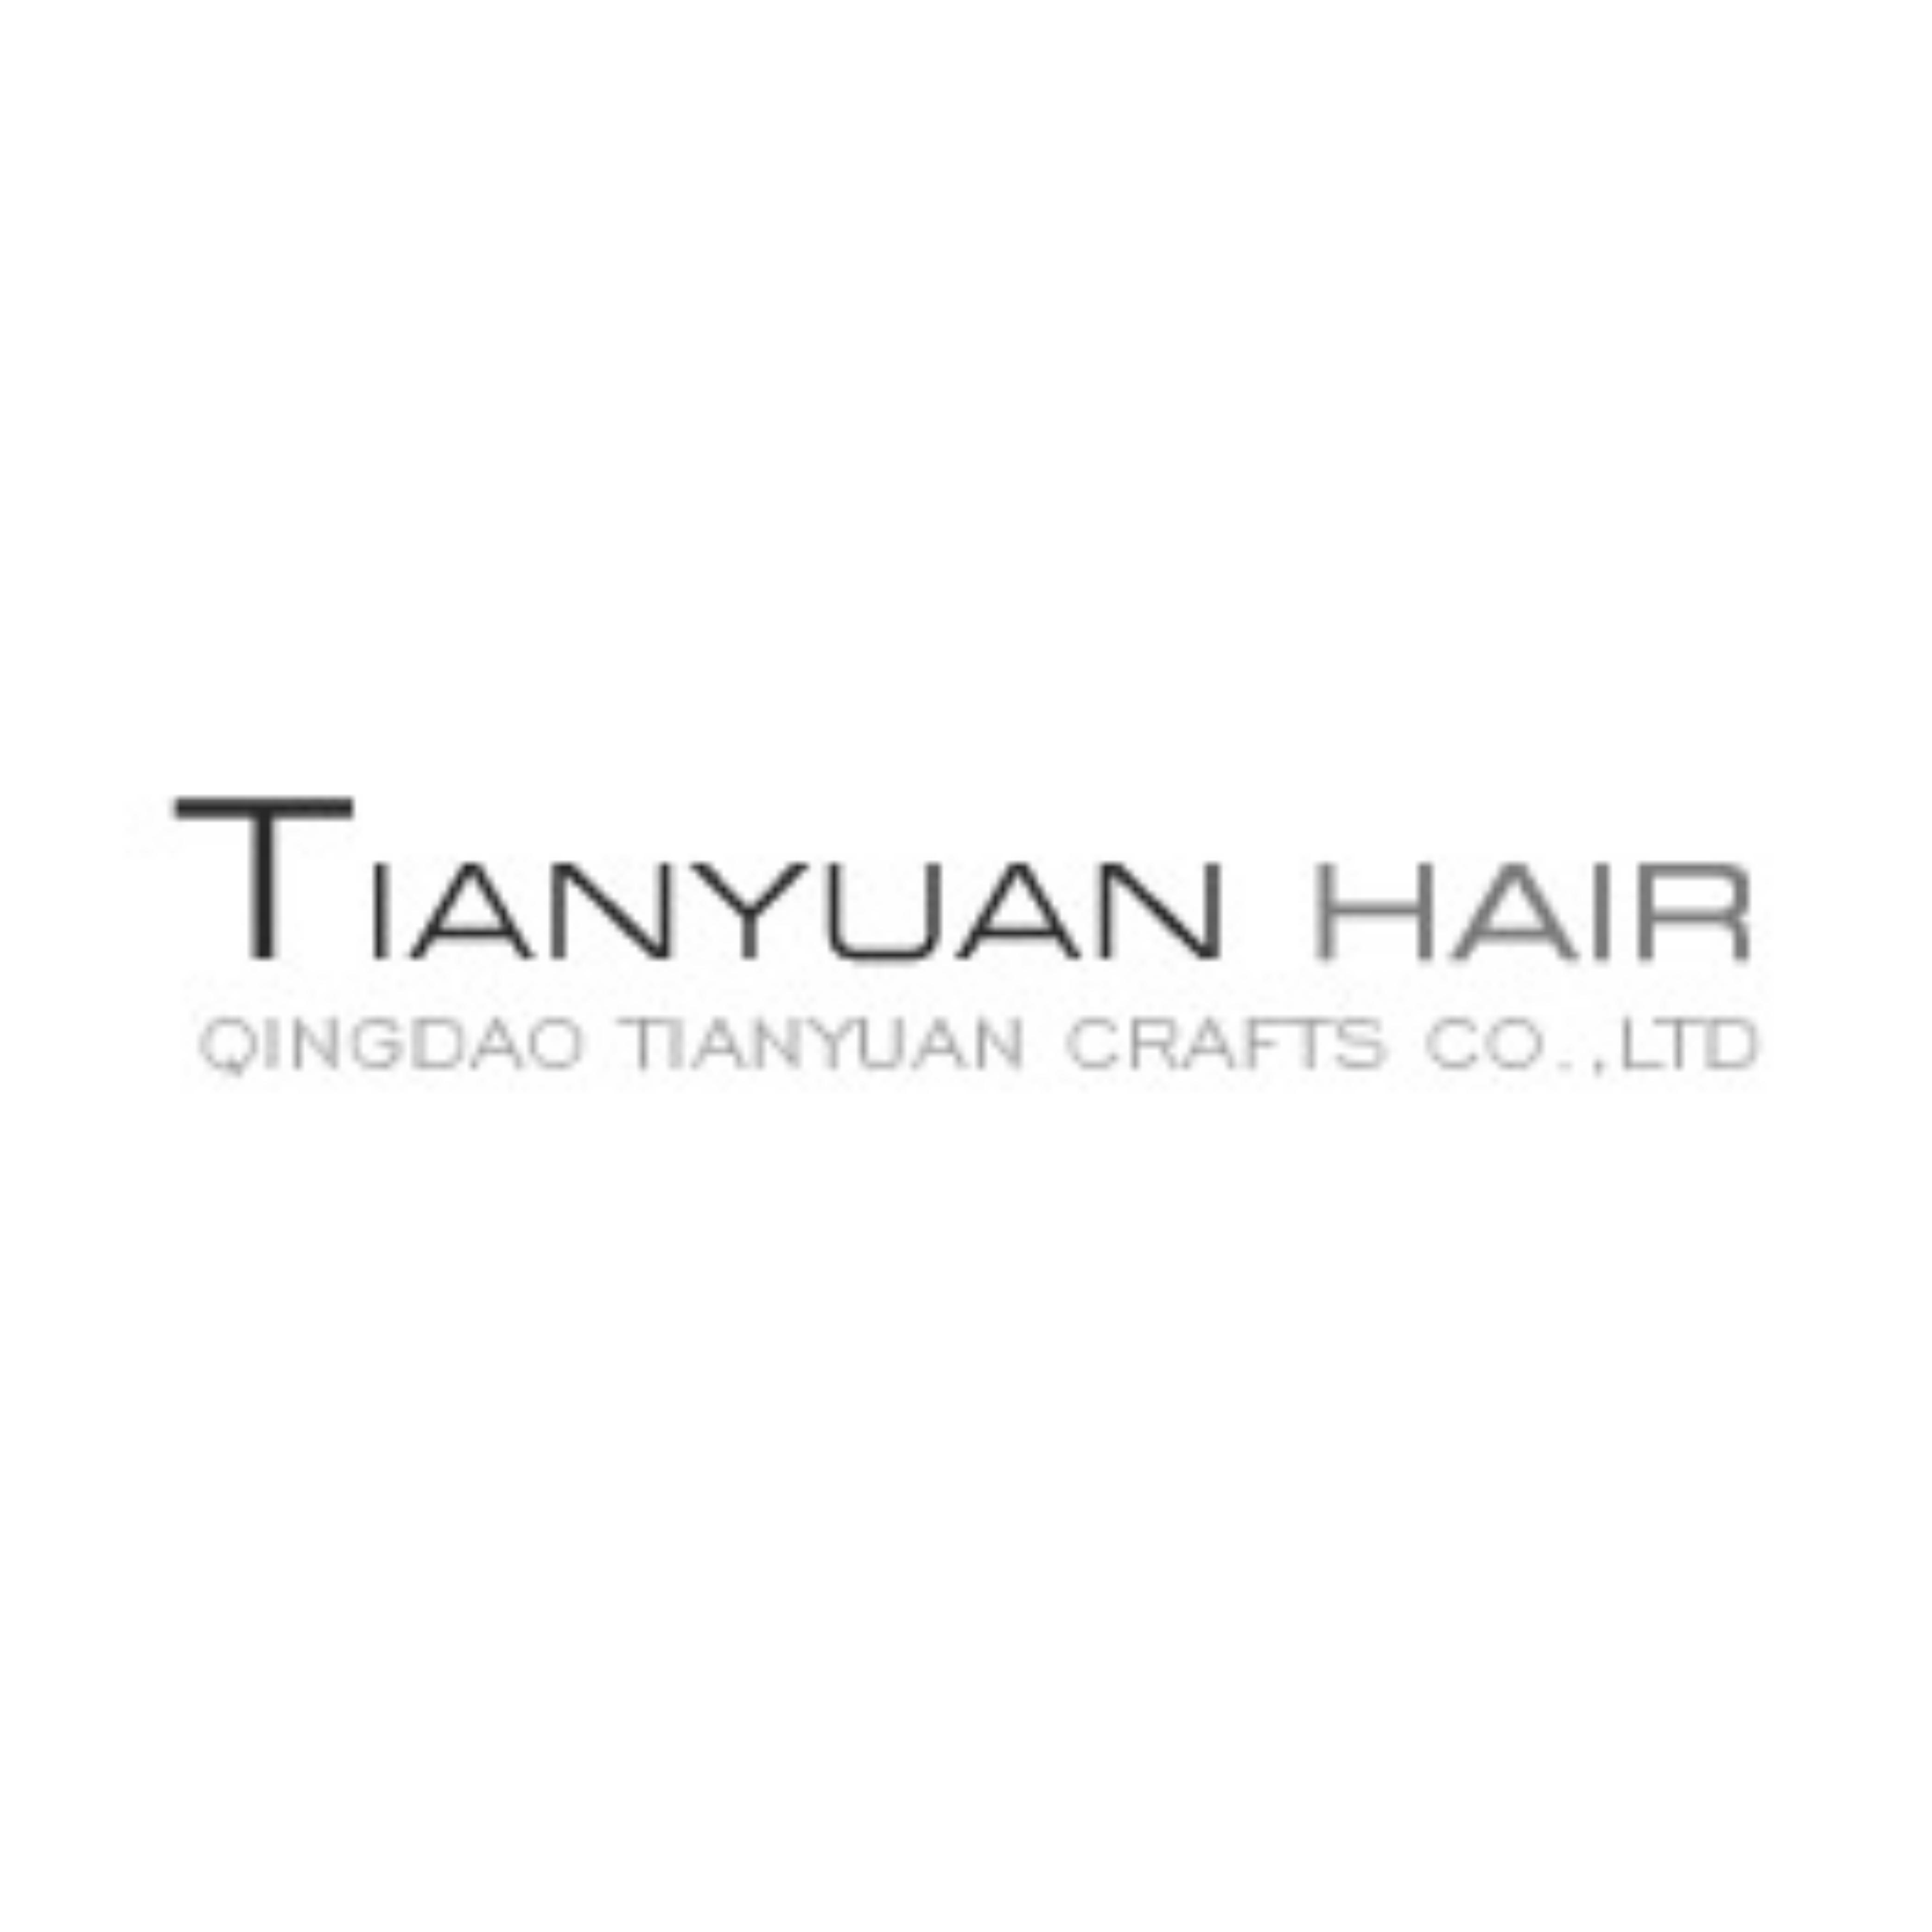 Tianyuan Hair